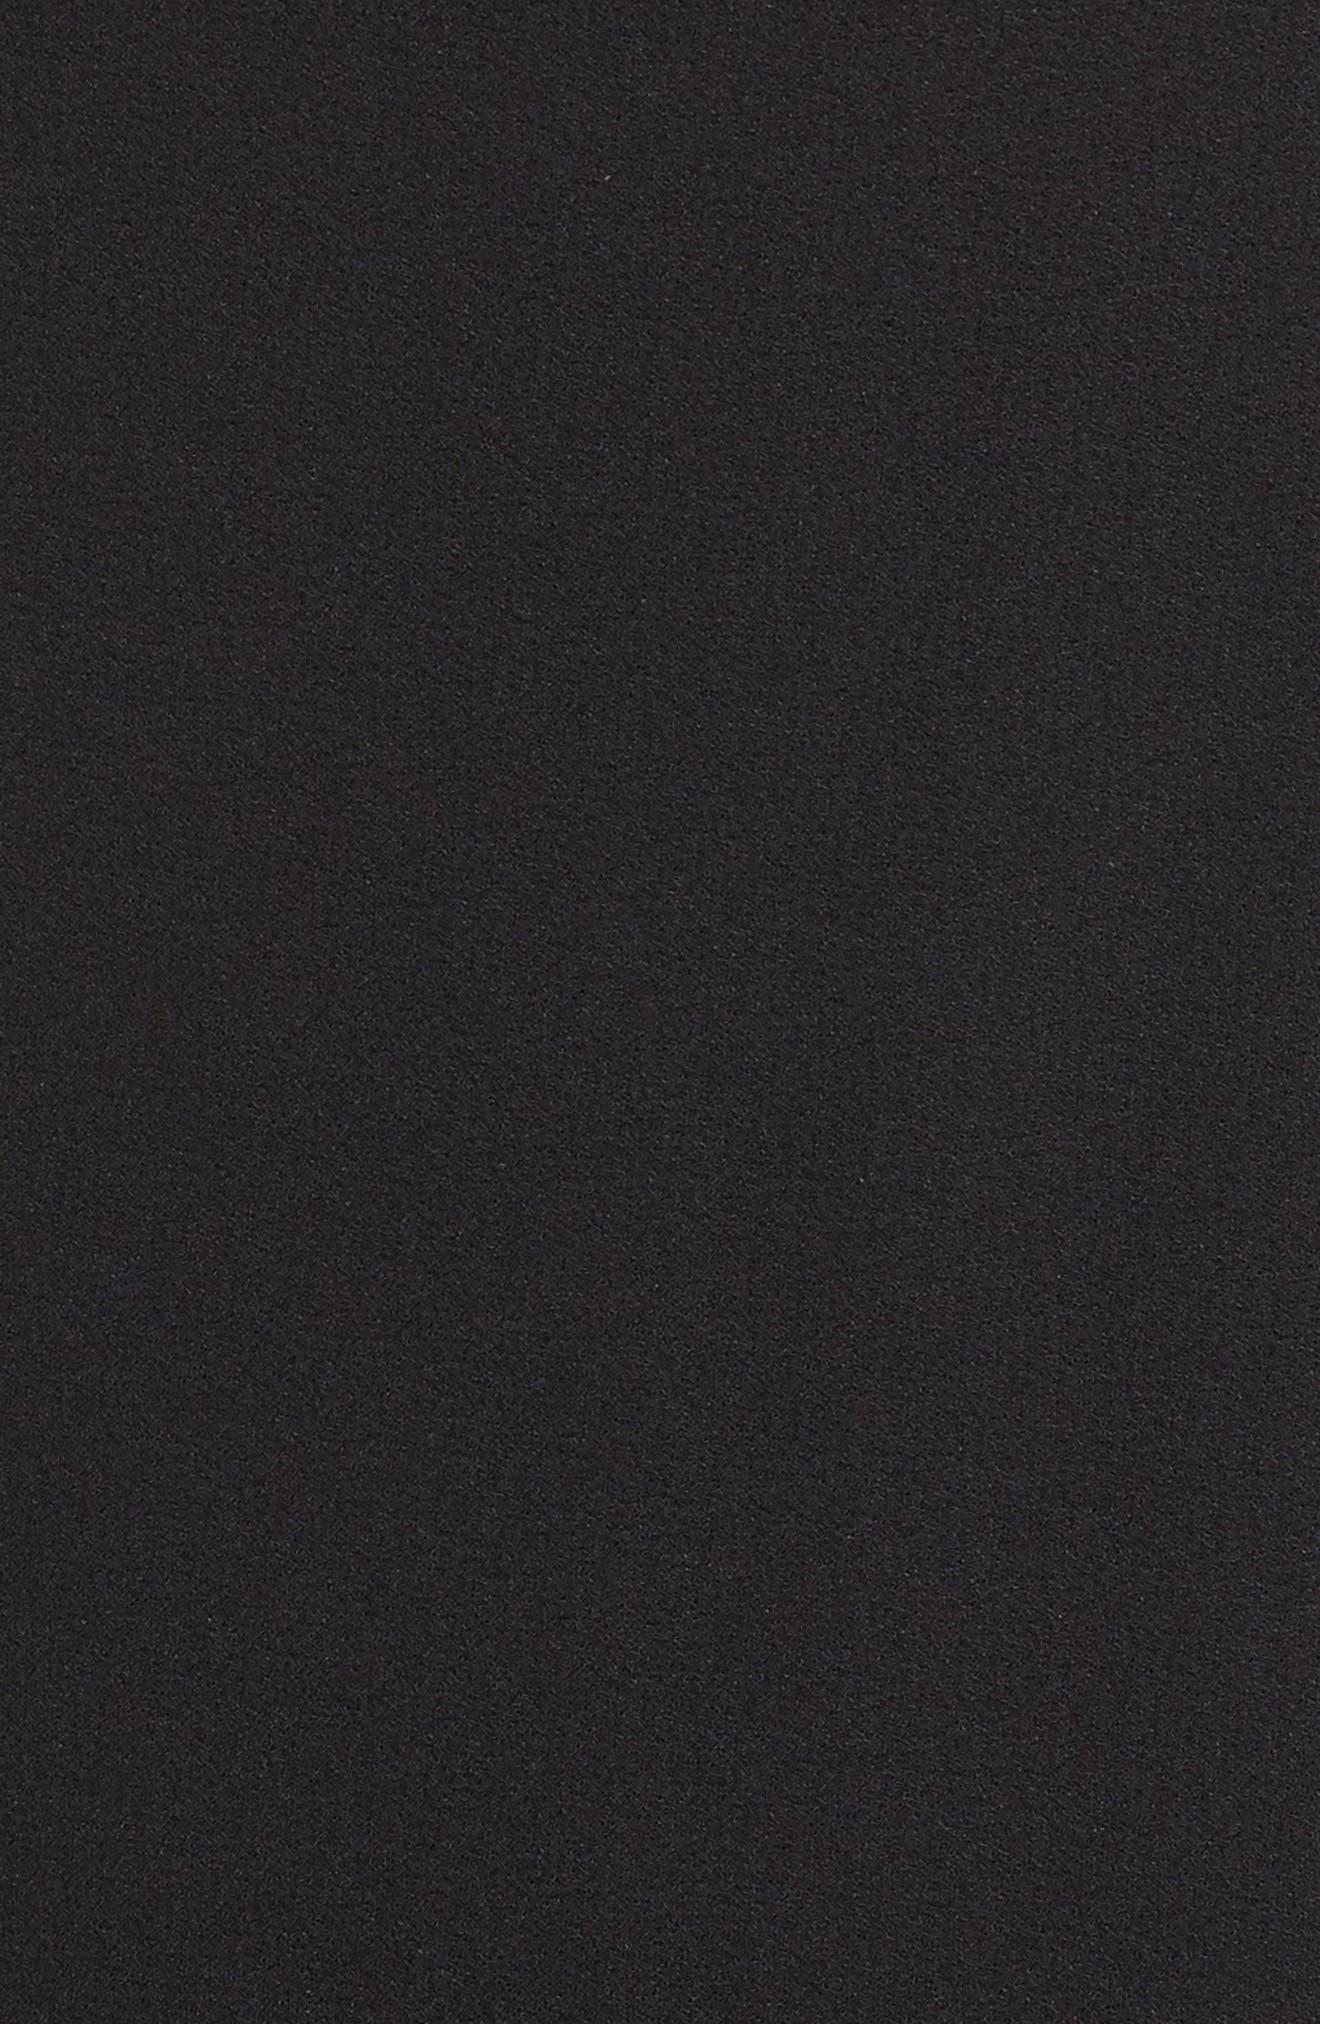 Ruffle Back Crepe Sheath Dress,                             Alternate thumbnail 5, color,                             Black